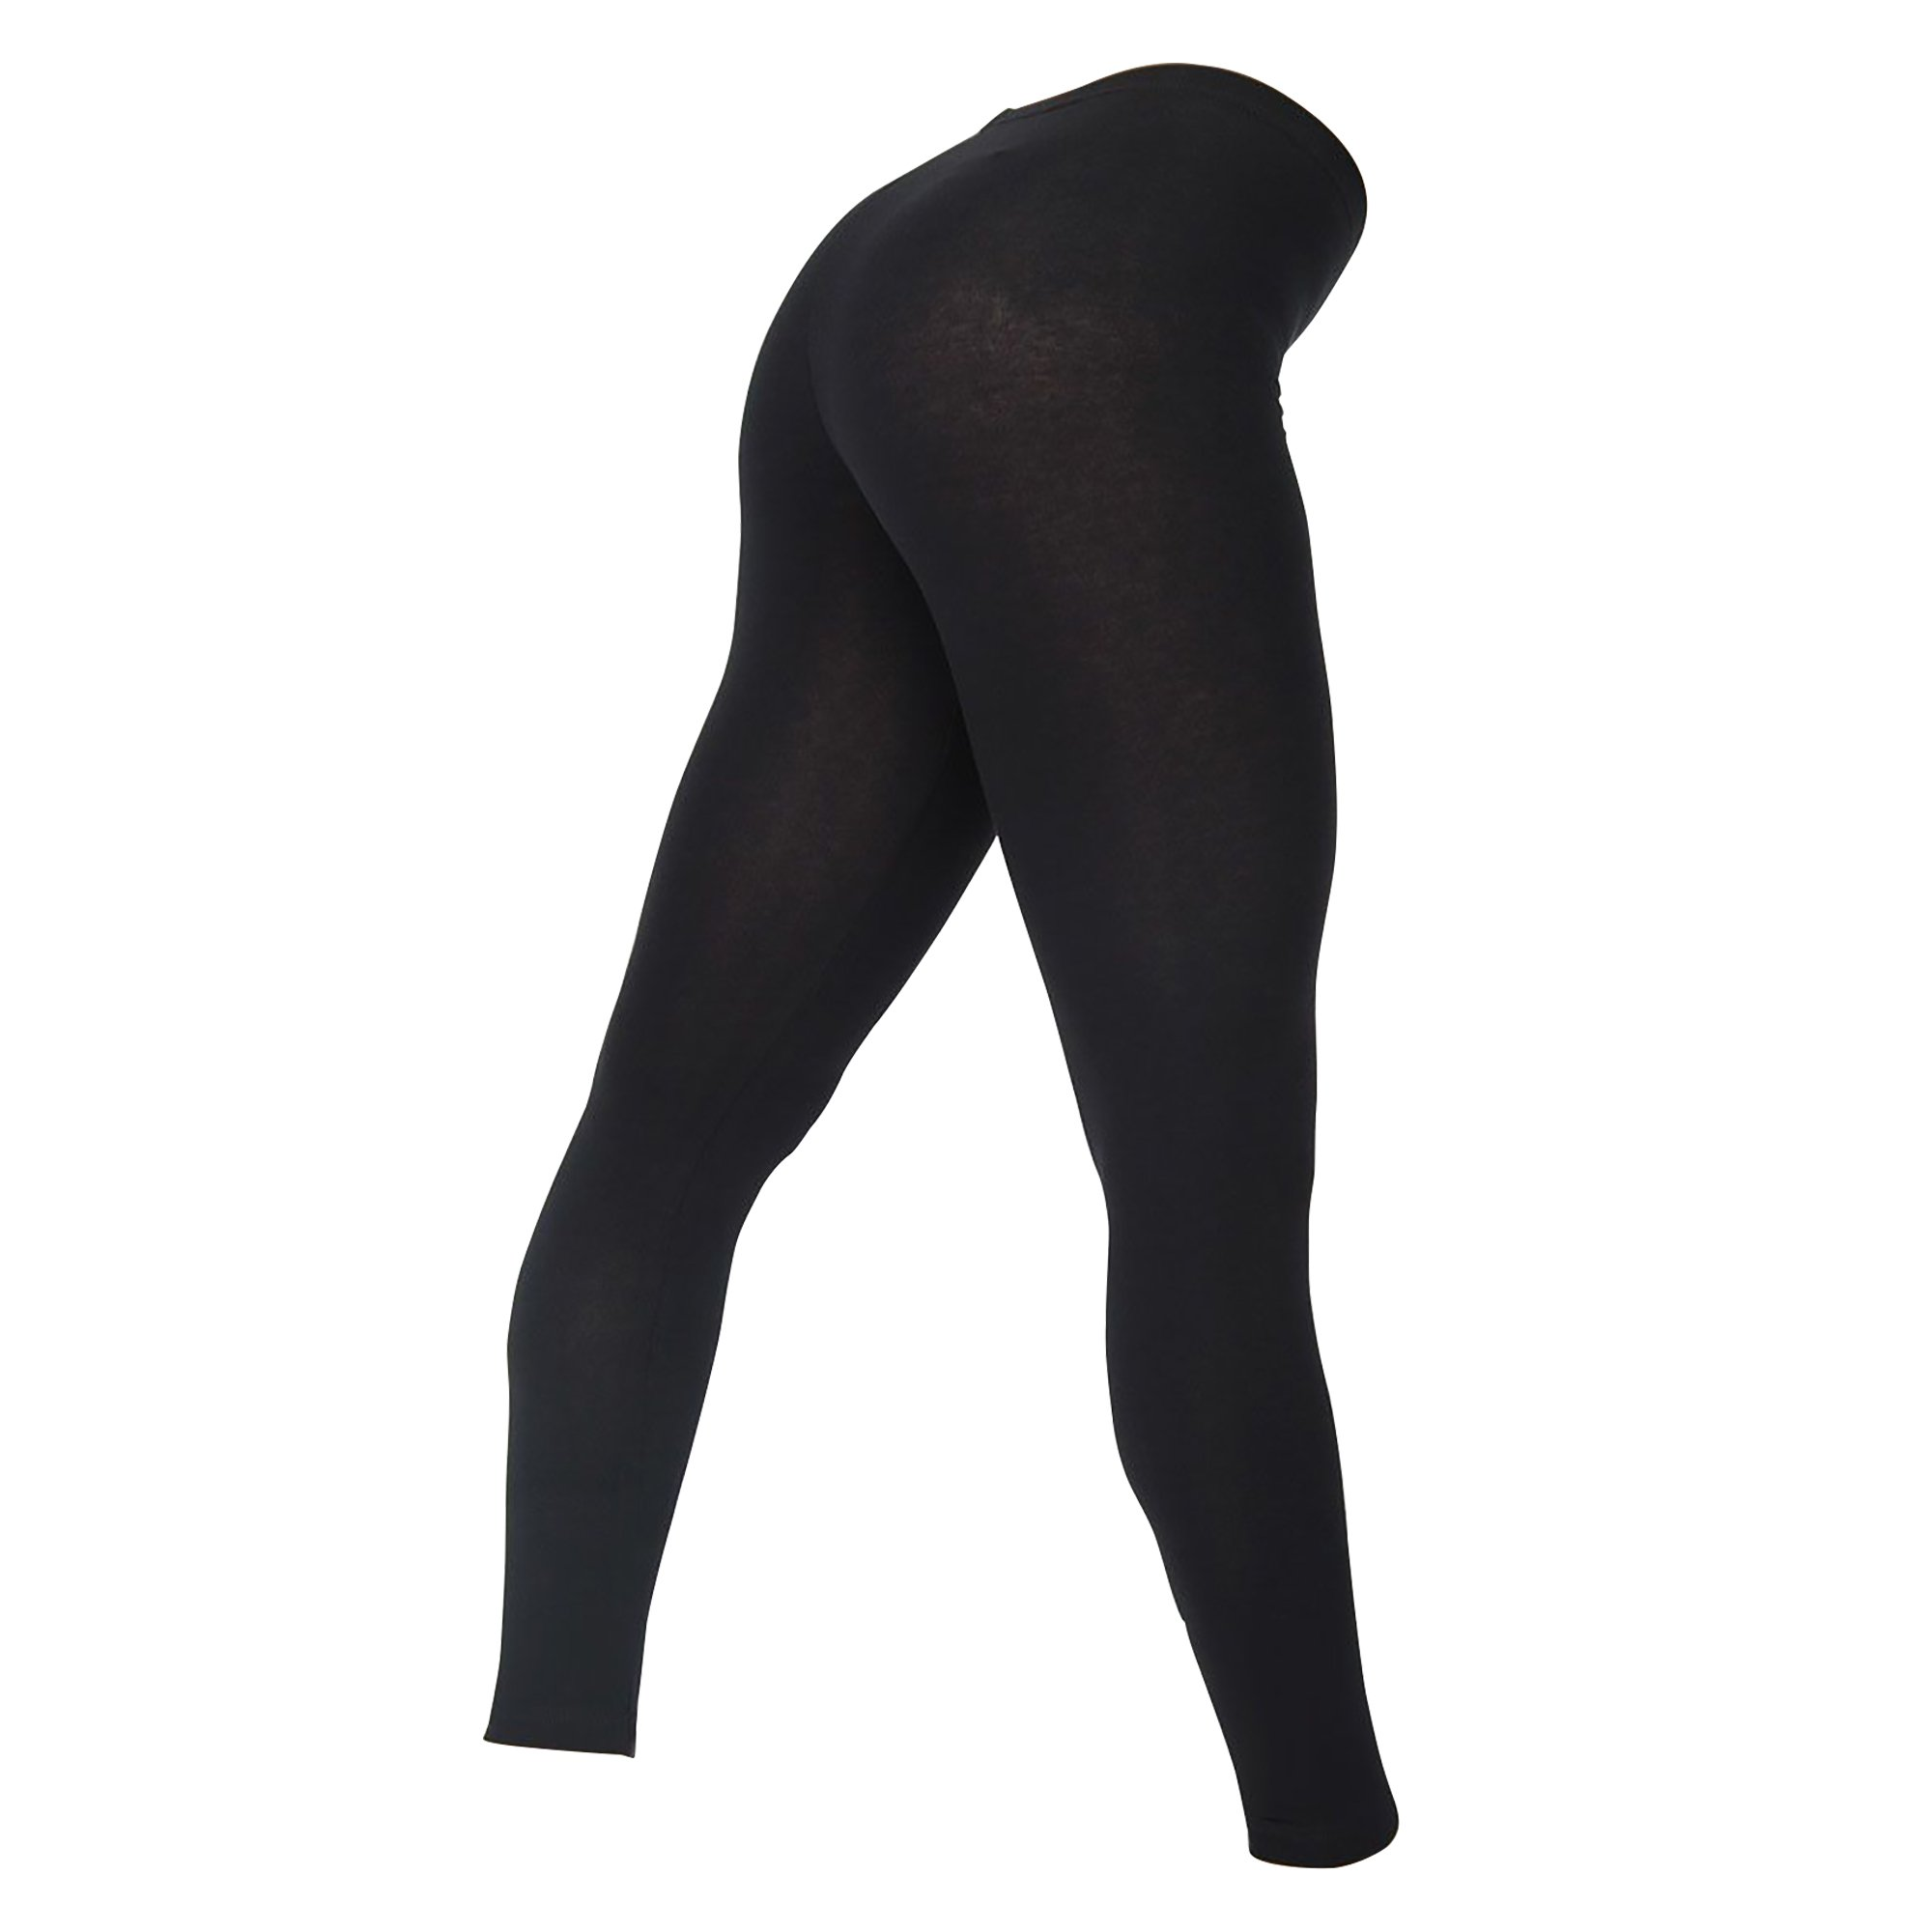 American Apparel Womens/Ladies Cotton Spandex Jersey Leggings (M) (Black)